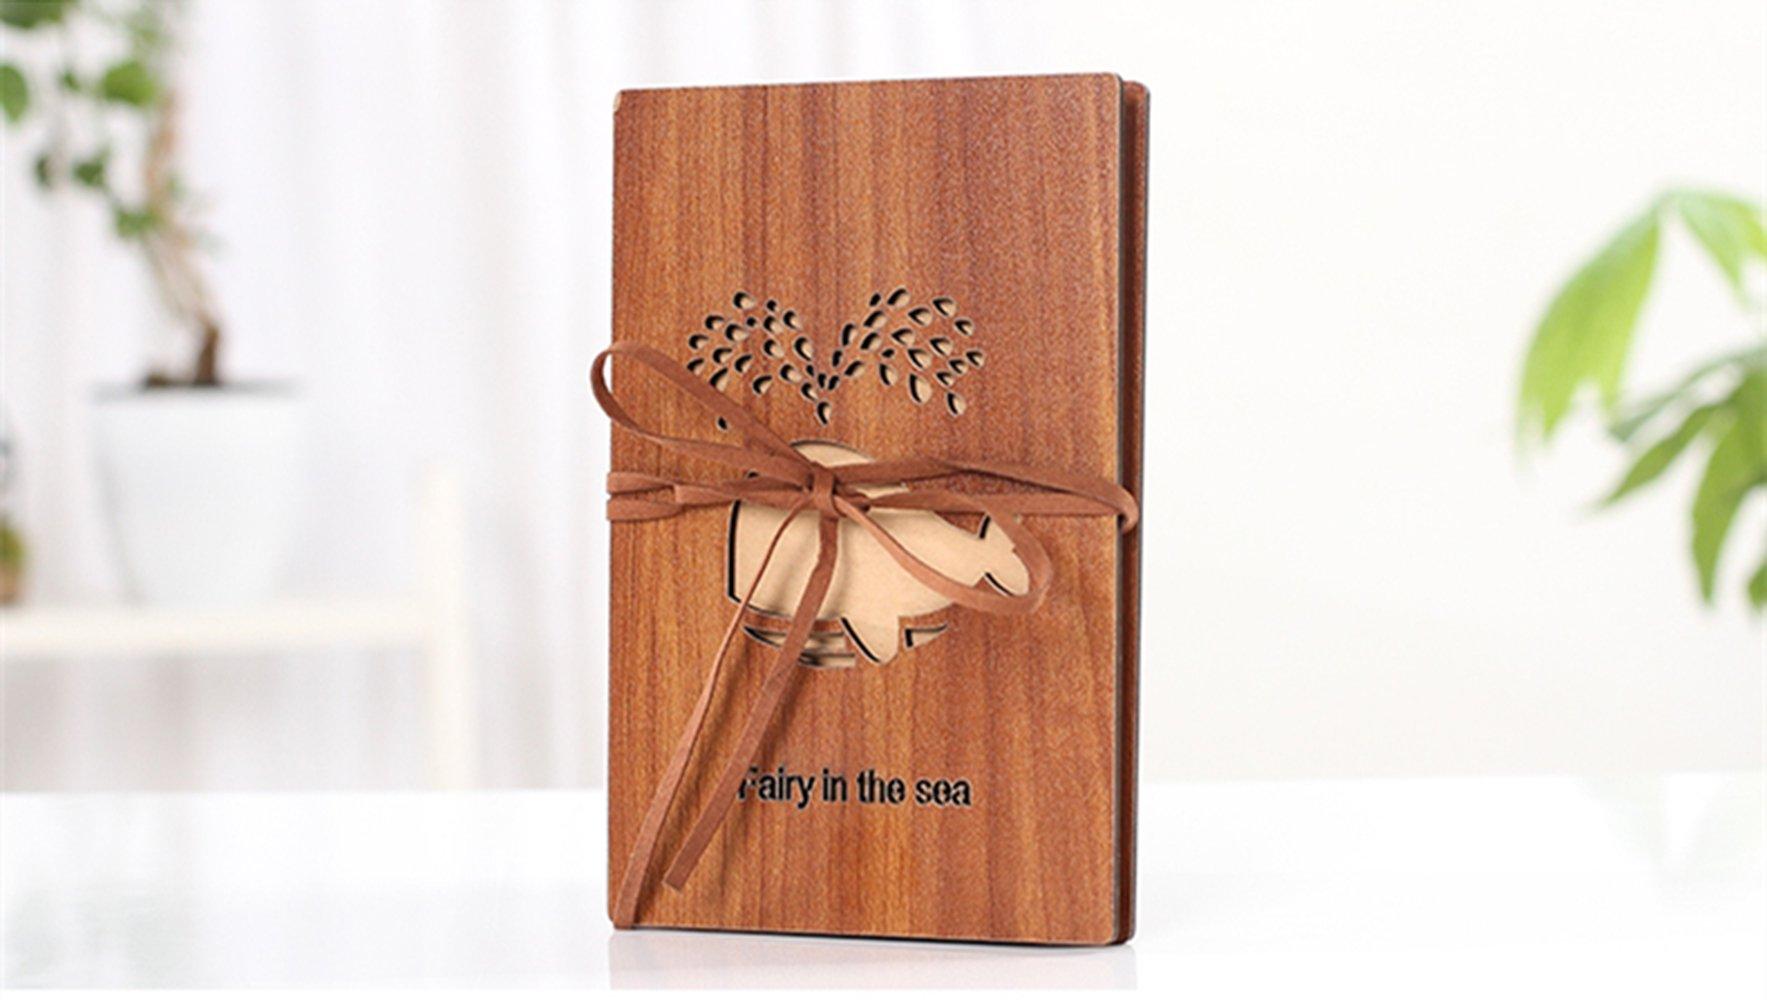 Longpro Hand Made Cute Wooden Cover Kraft Paper Folding Photo Album Folding Photo Album DIY Photo Album Folding Photo Album Personalized Birthday Gift Notebook Wedding Guest Book (Whale)